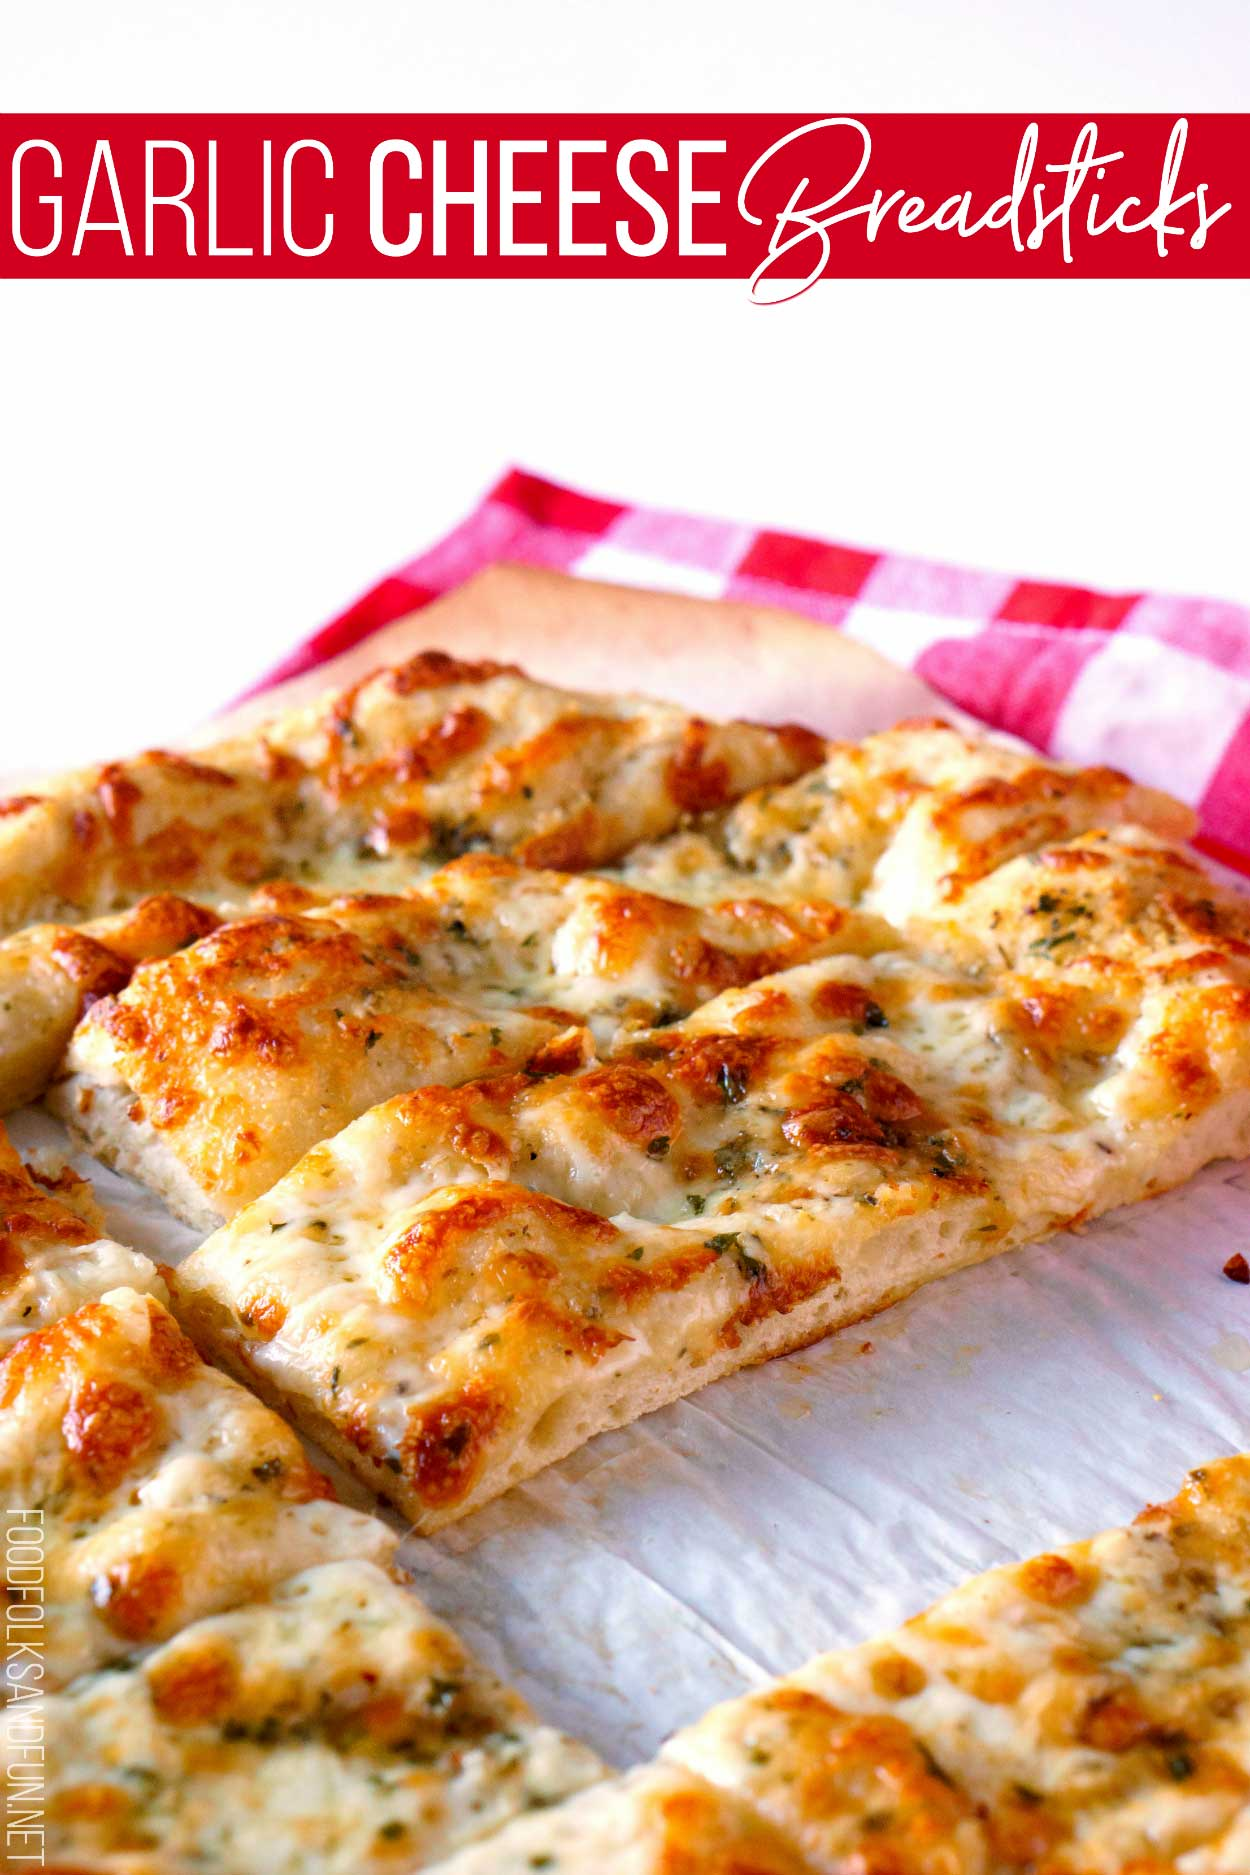 Homemade Garlic Cheese Breadsticks.